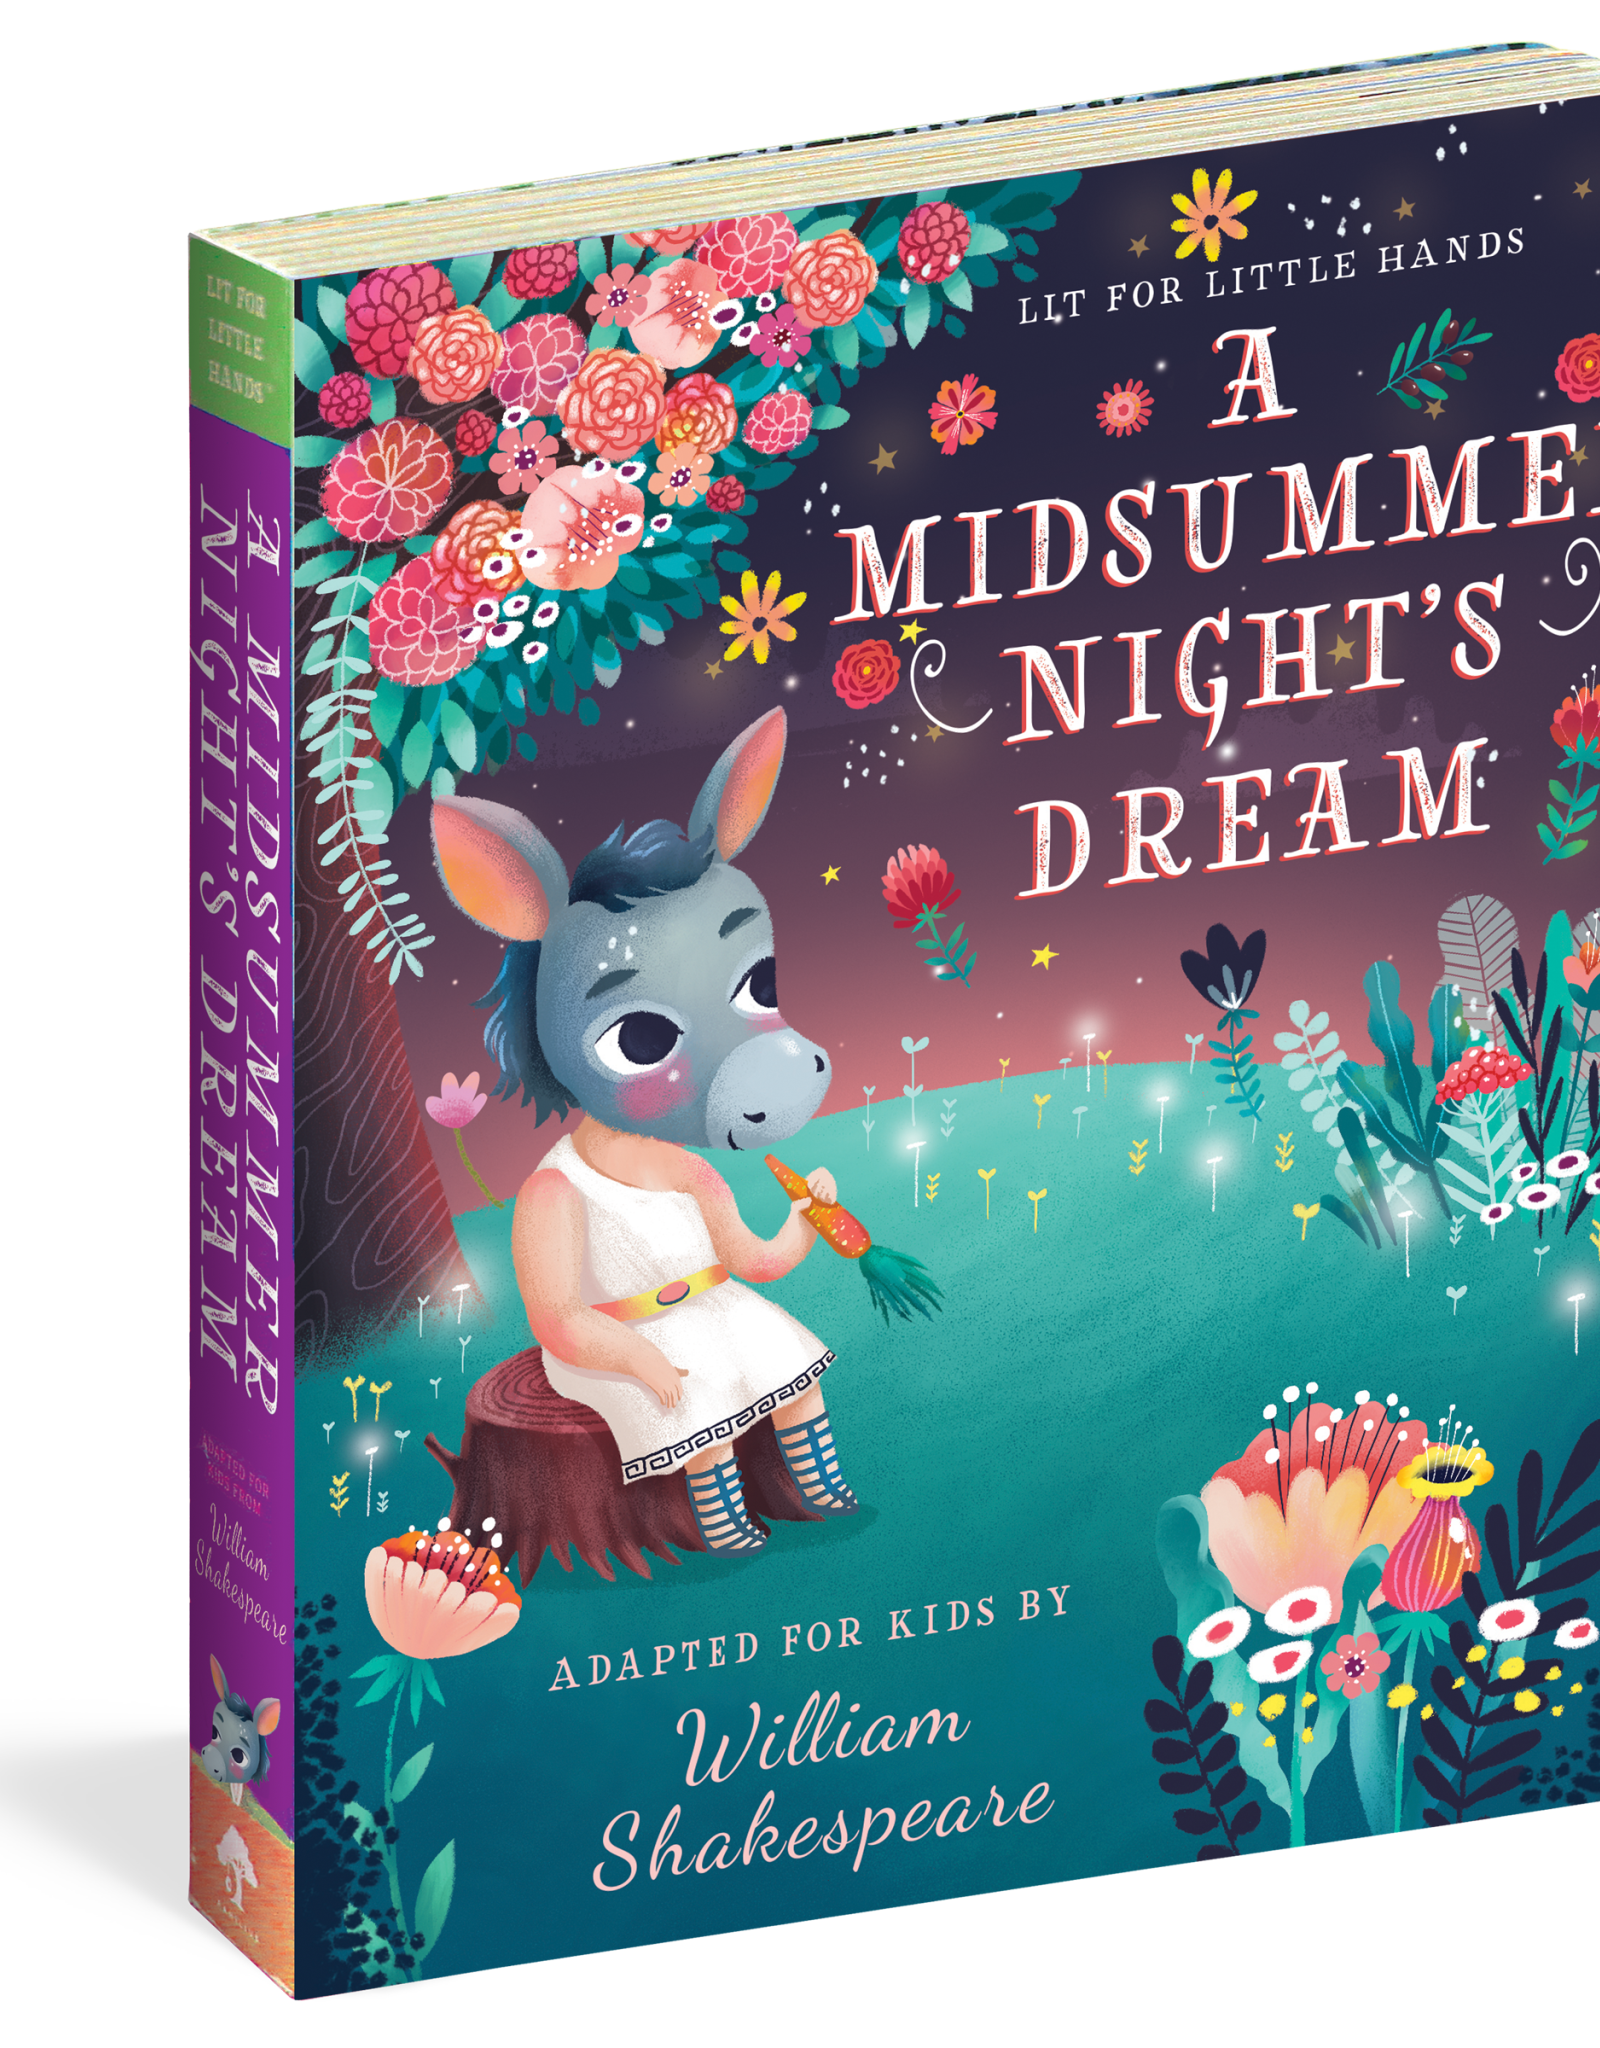 Lit for Little Hands: A Midsummer Night's Dream adapted by Brooke Jordenby